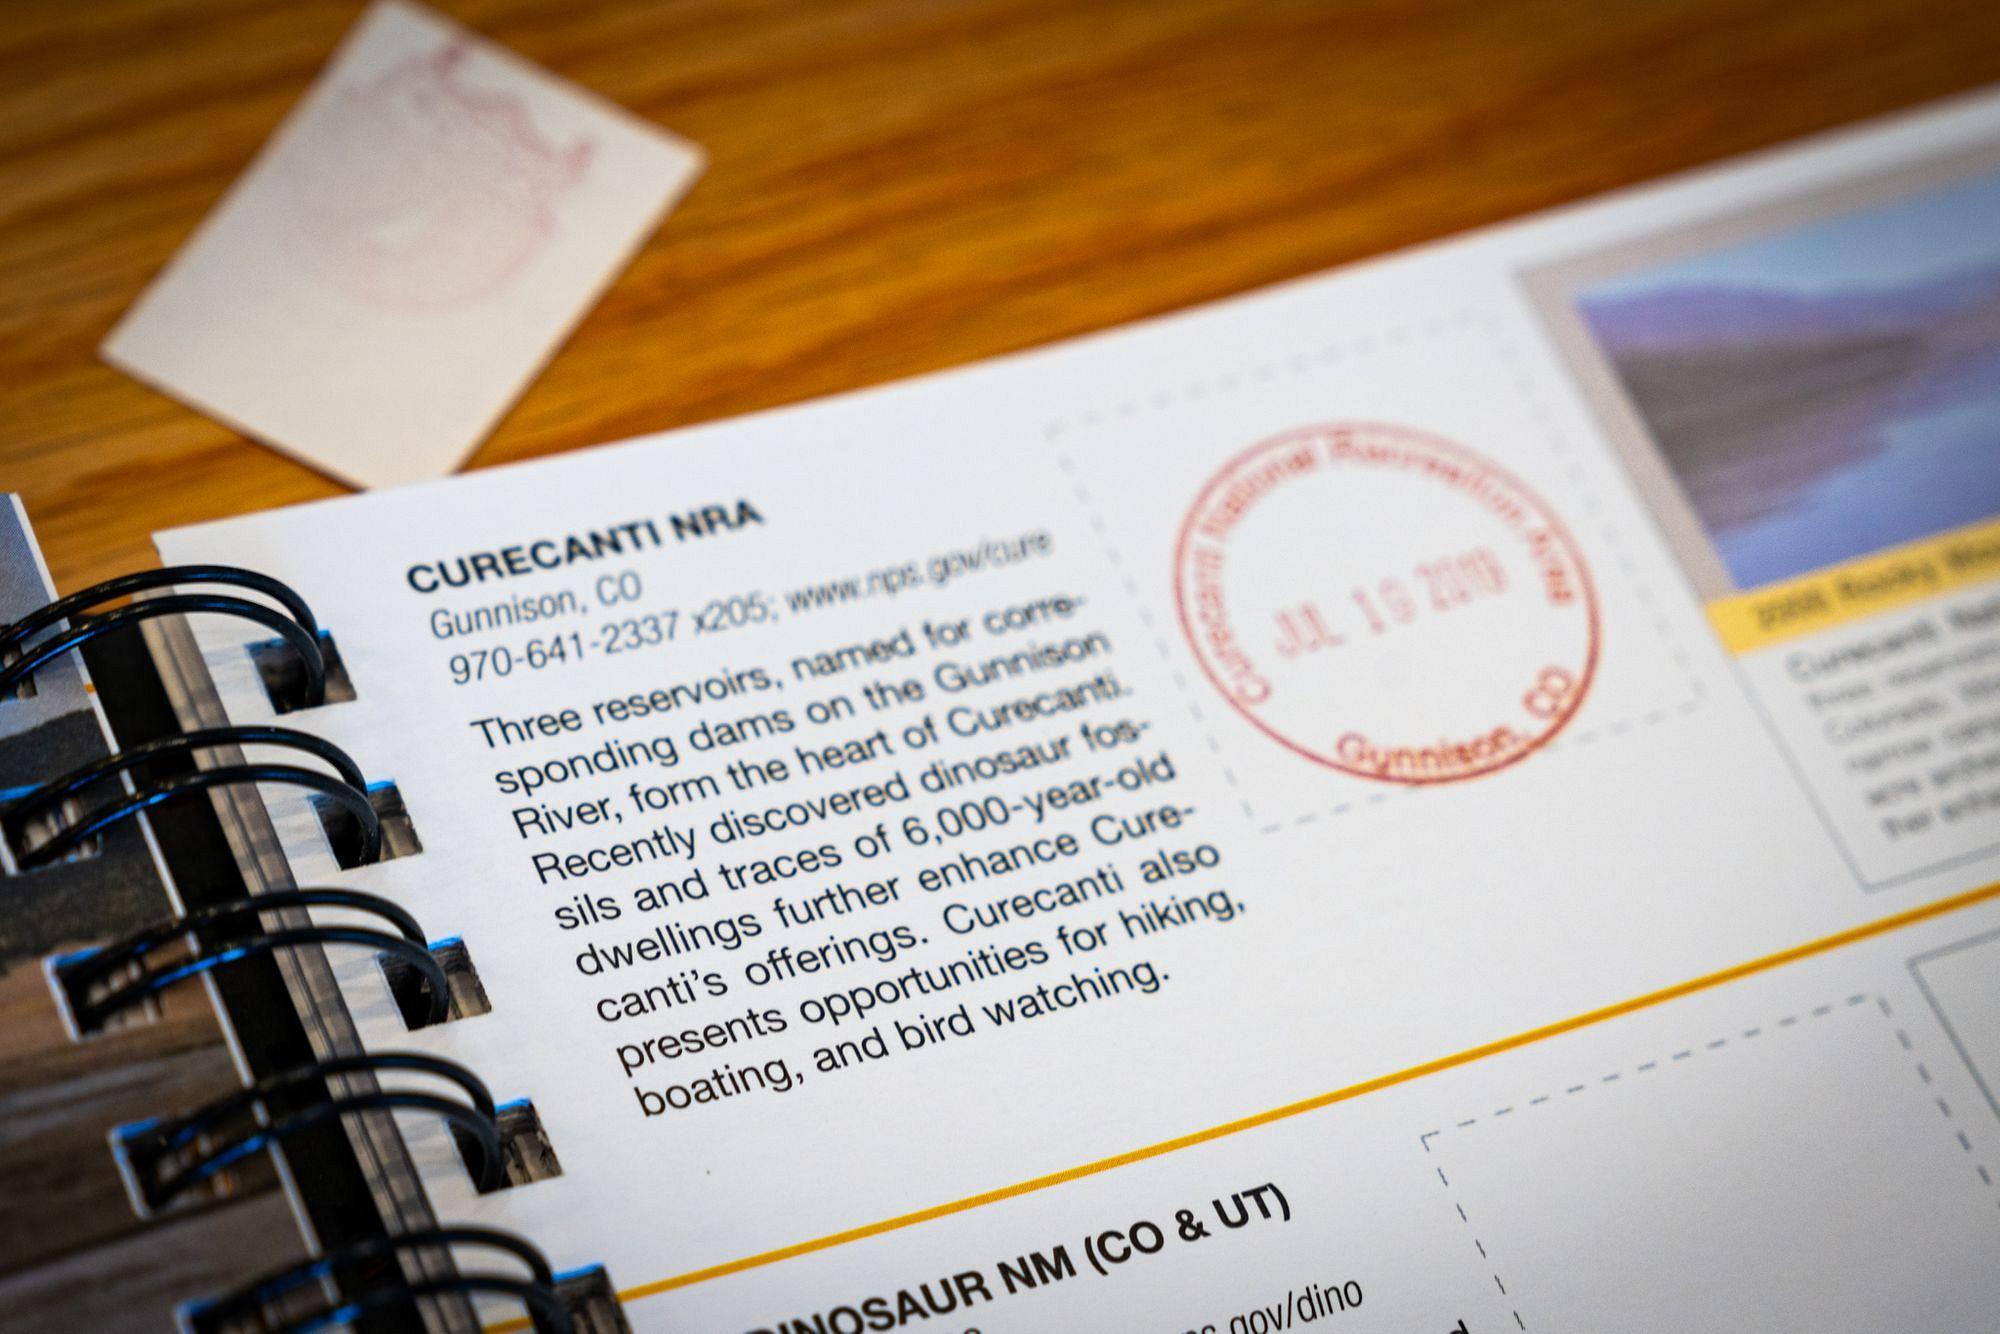 Curecanti NRA Park Passport Stamp